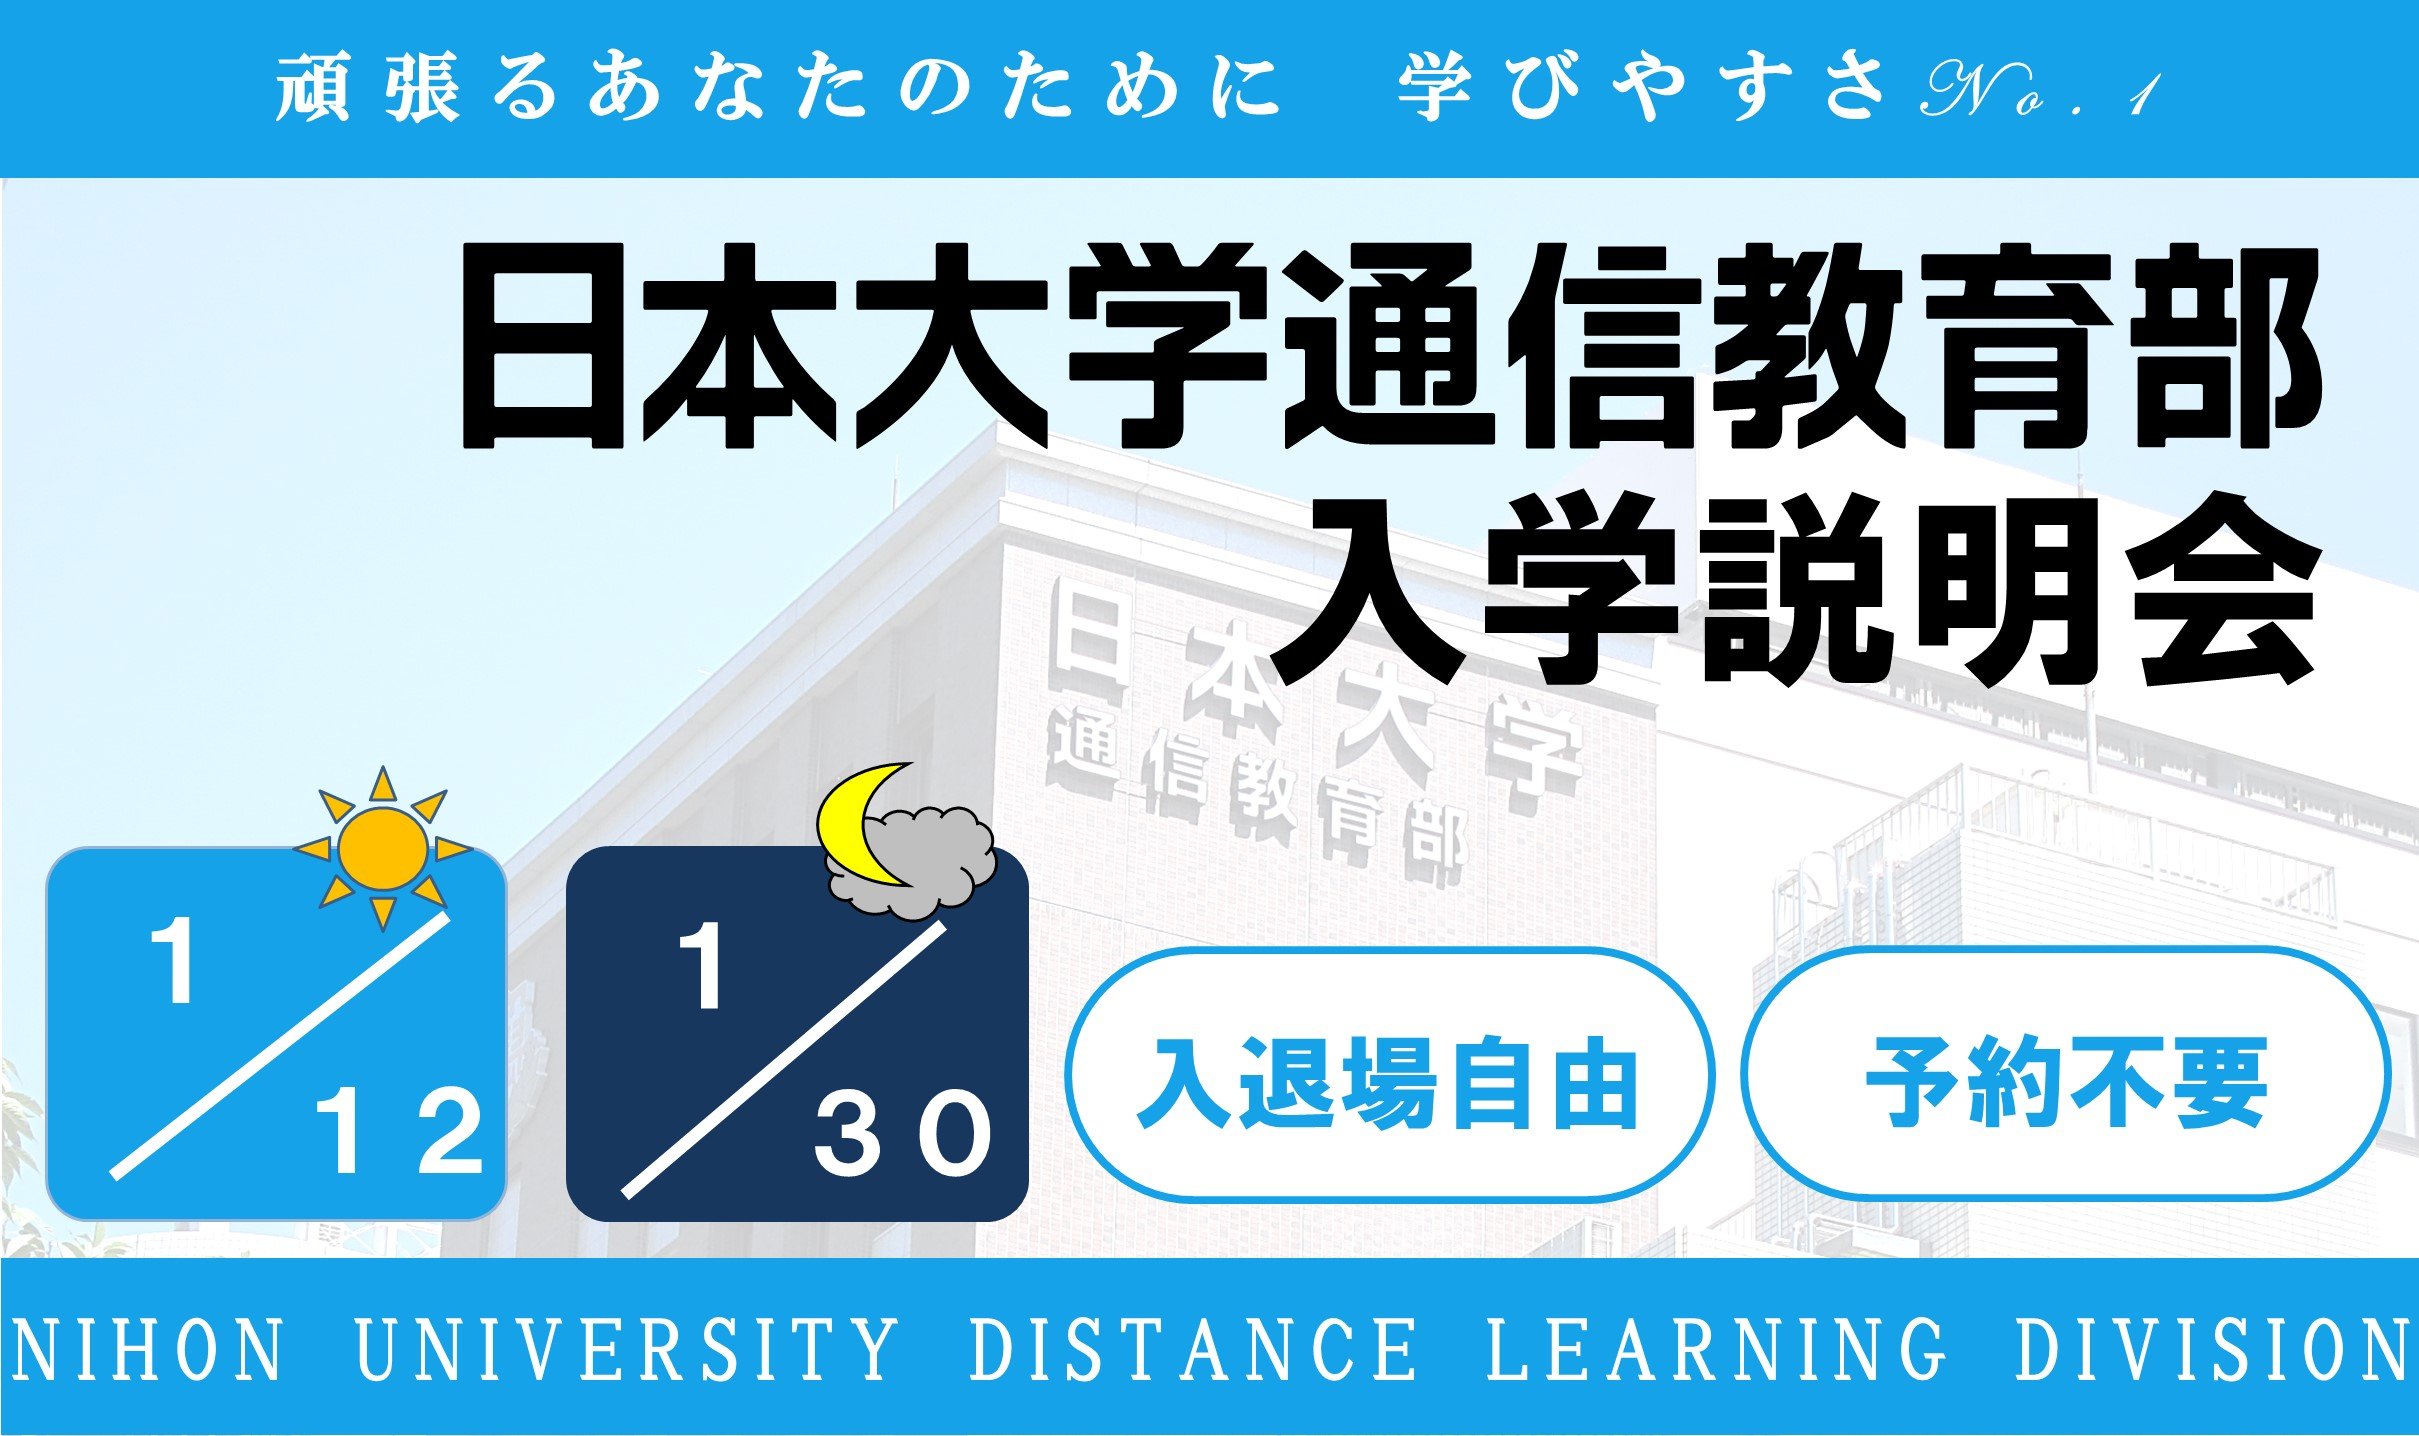 令和2年度4月入学向け説明会(1月)